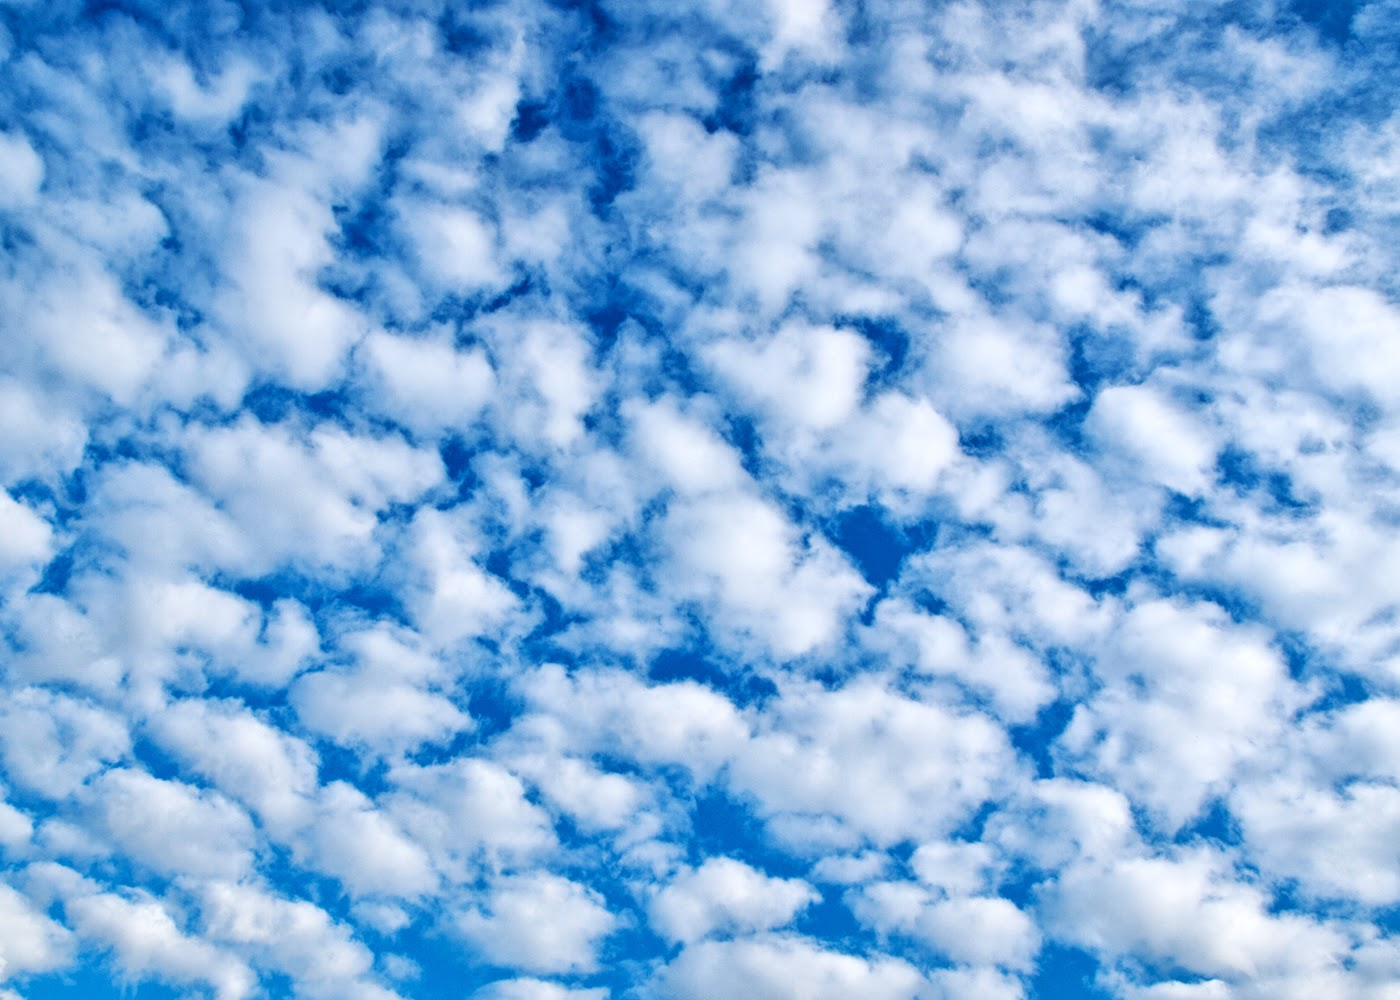 365 One Photo A Day Altocumulus Clouds